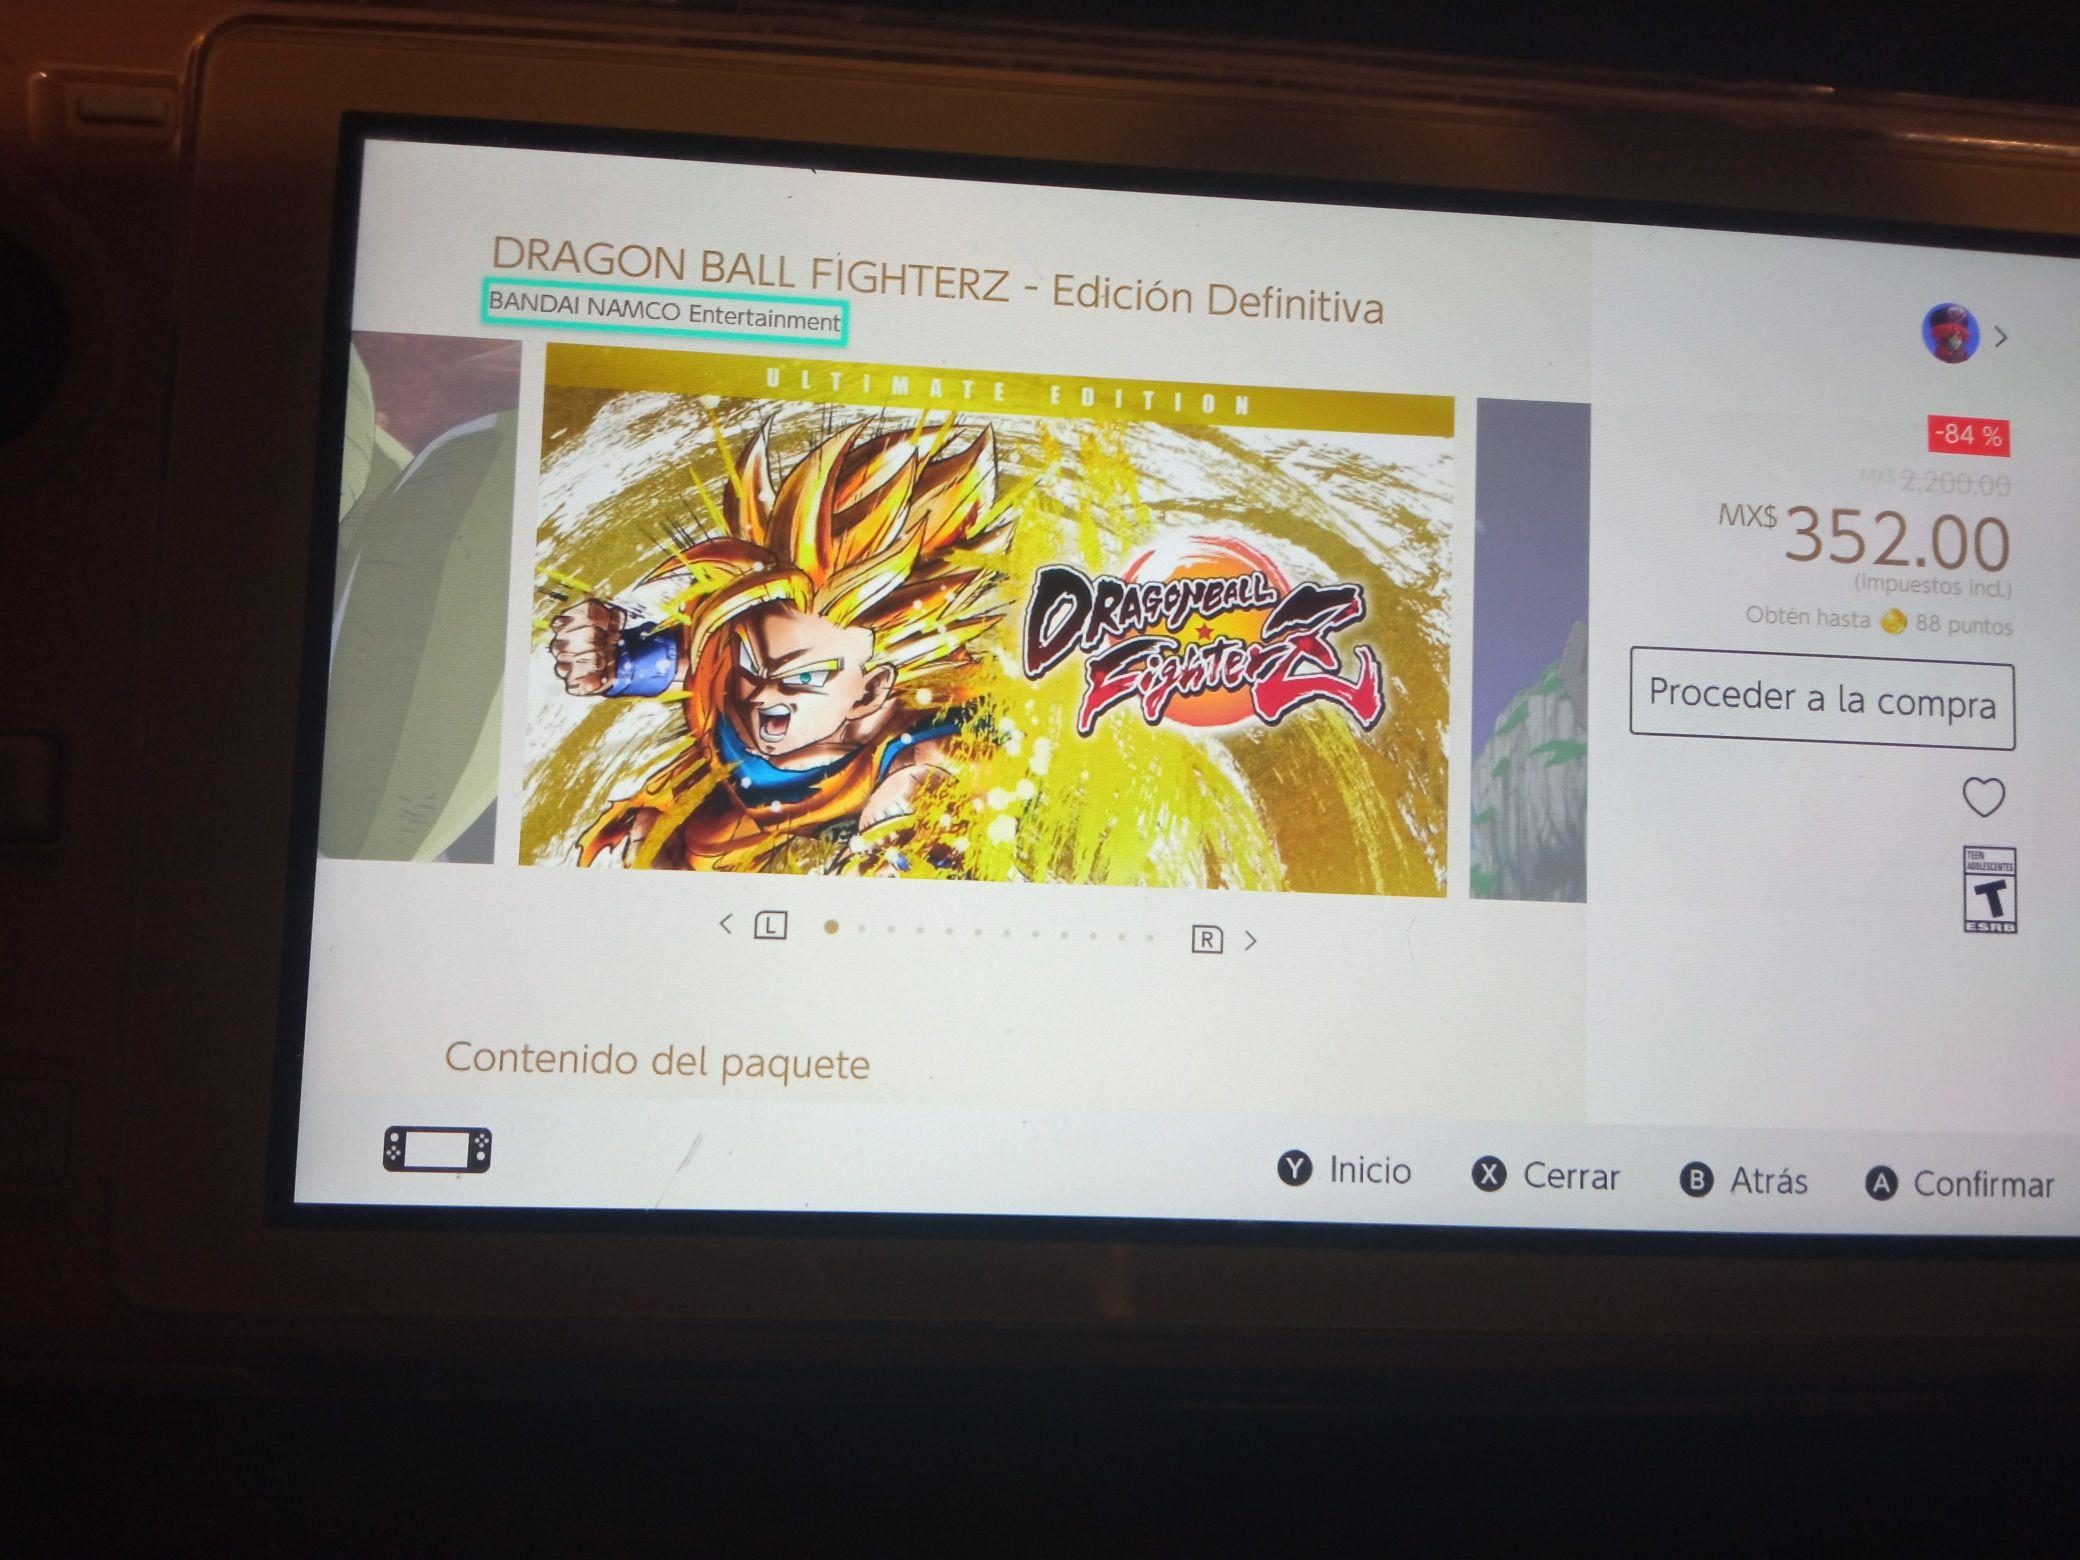 Nintendo eShop: Dragon ball fighters edición definitiva